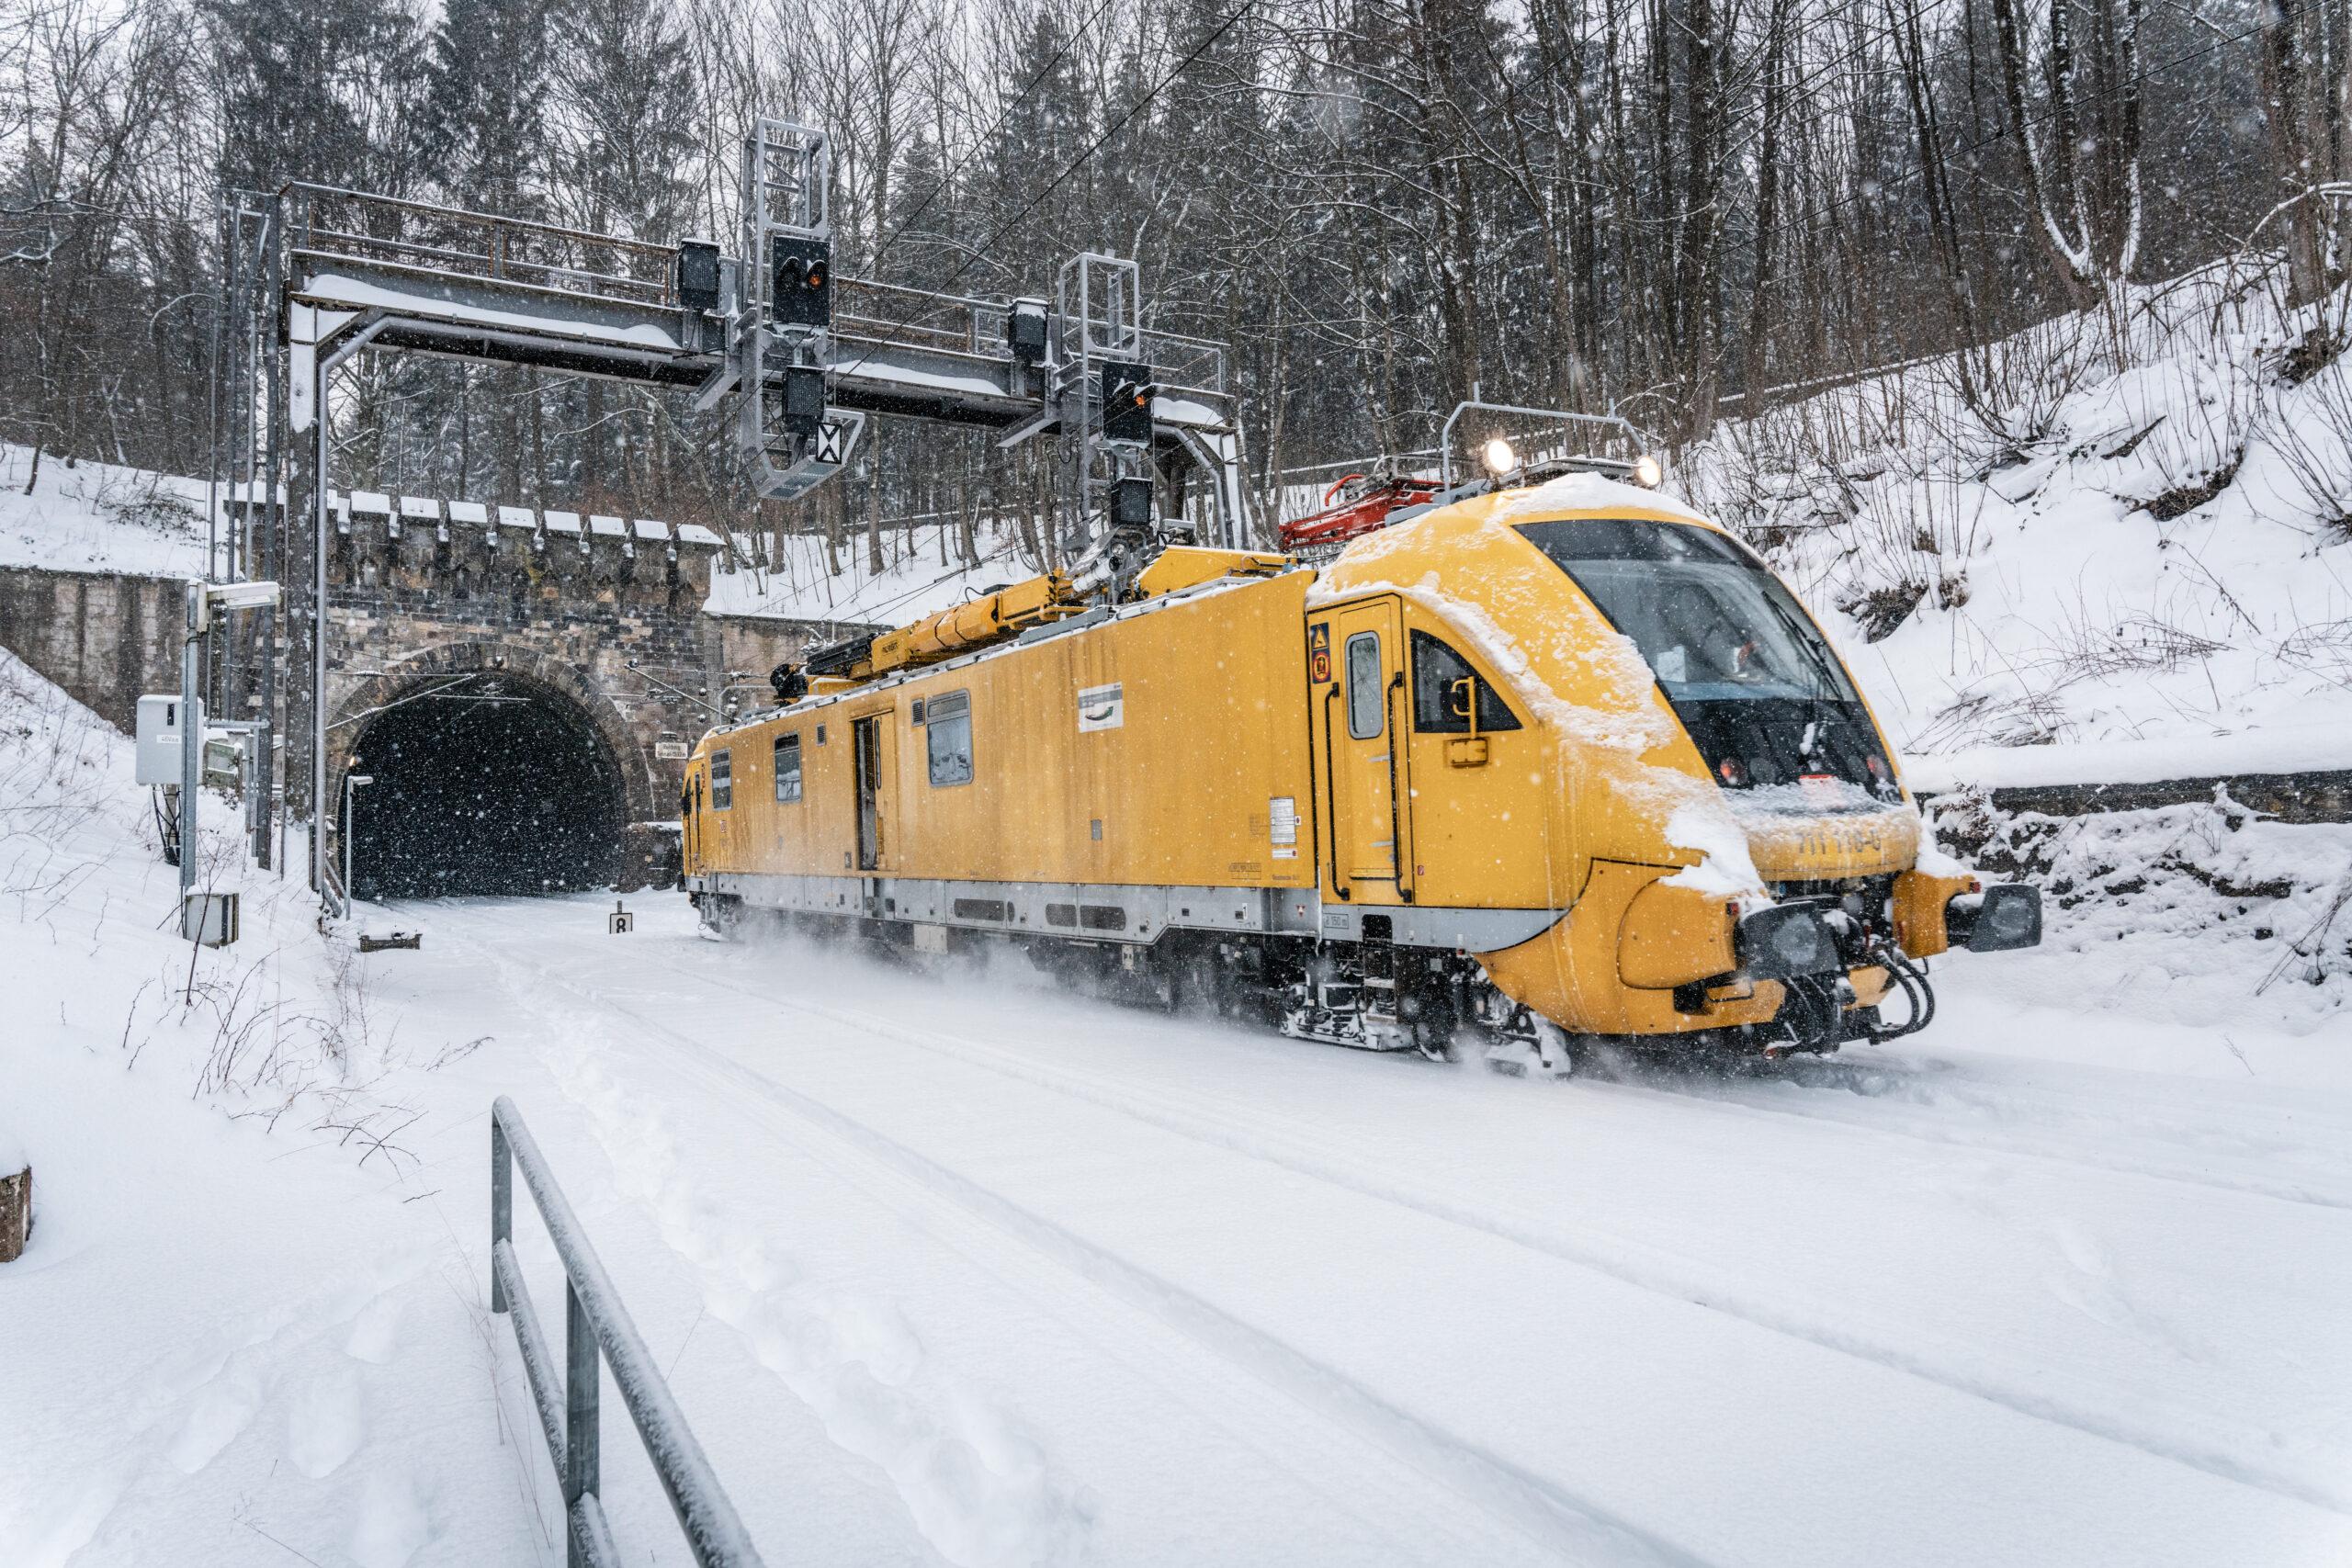 Overhead line equipment maintenance vehicle in North-Rhine Westphalia